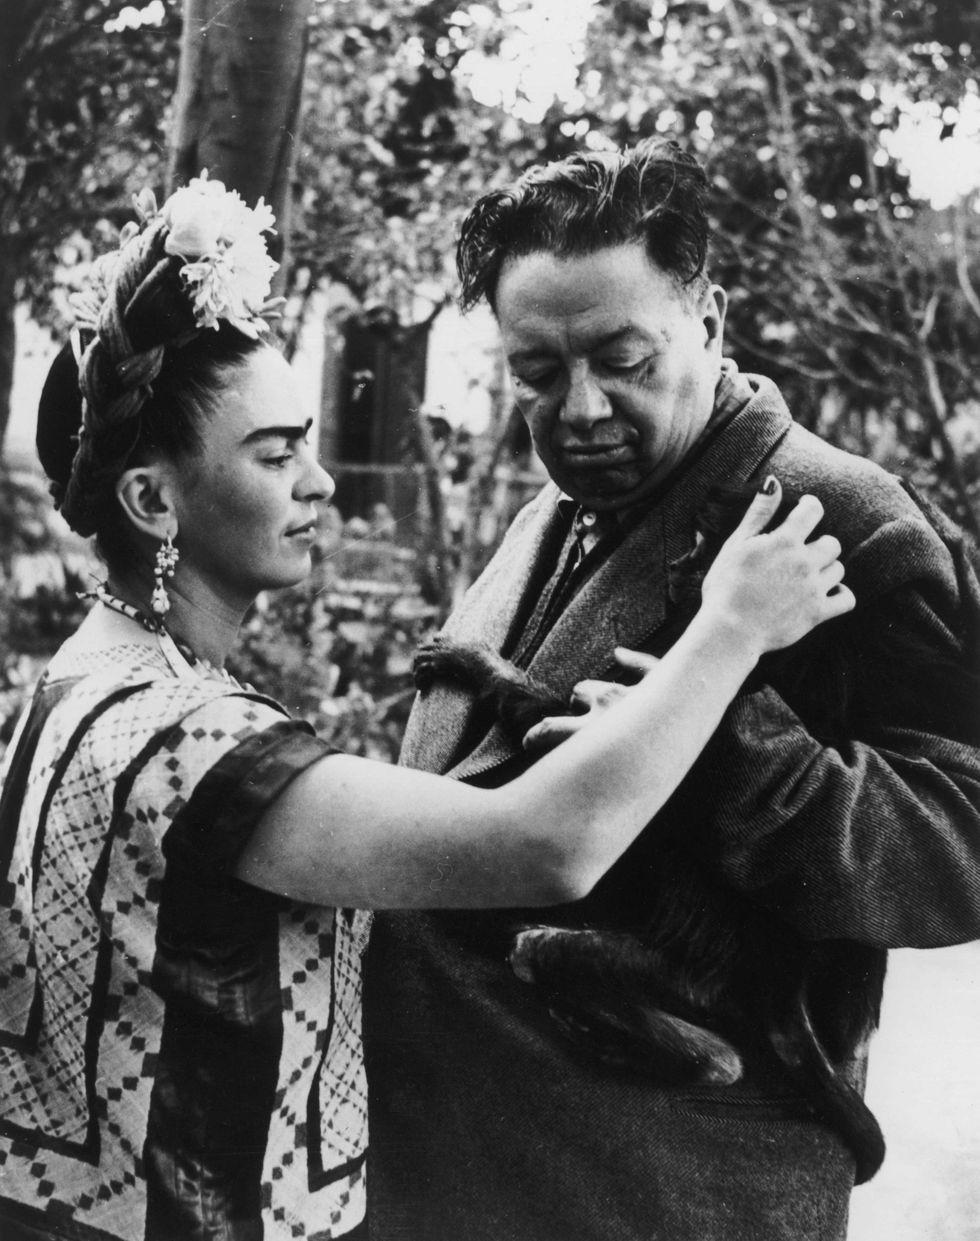 Diego Rivera and Frida Kahlo